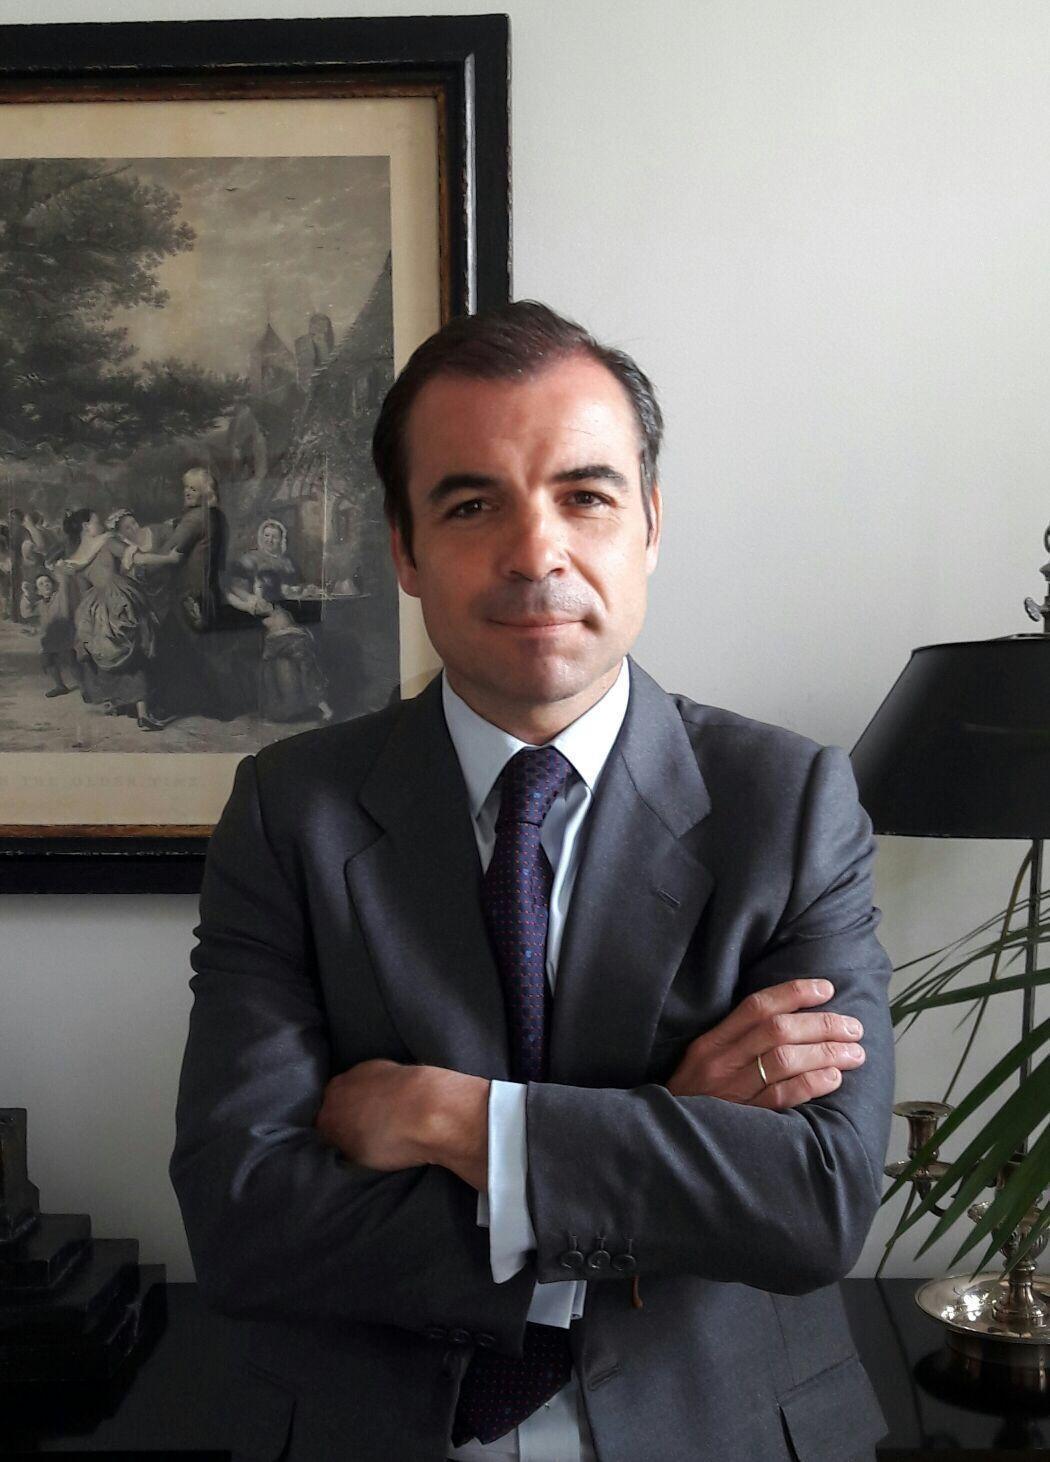 Fernando Gómez de Barreda, Altair